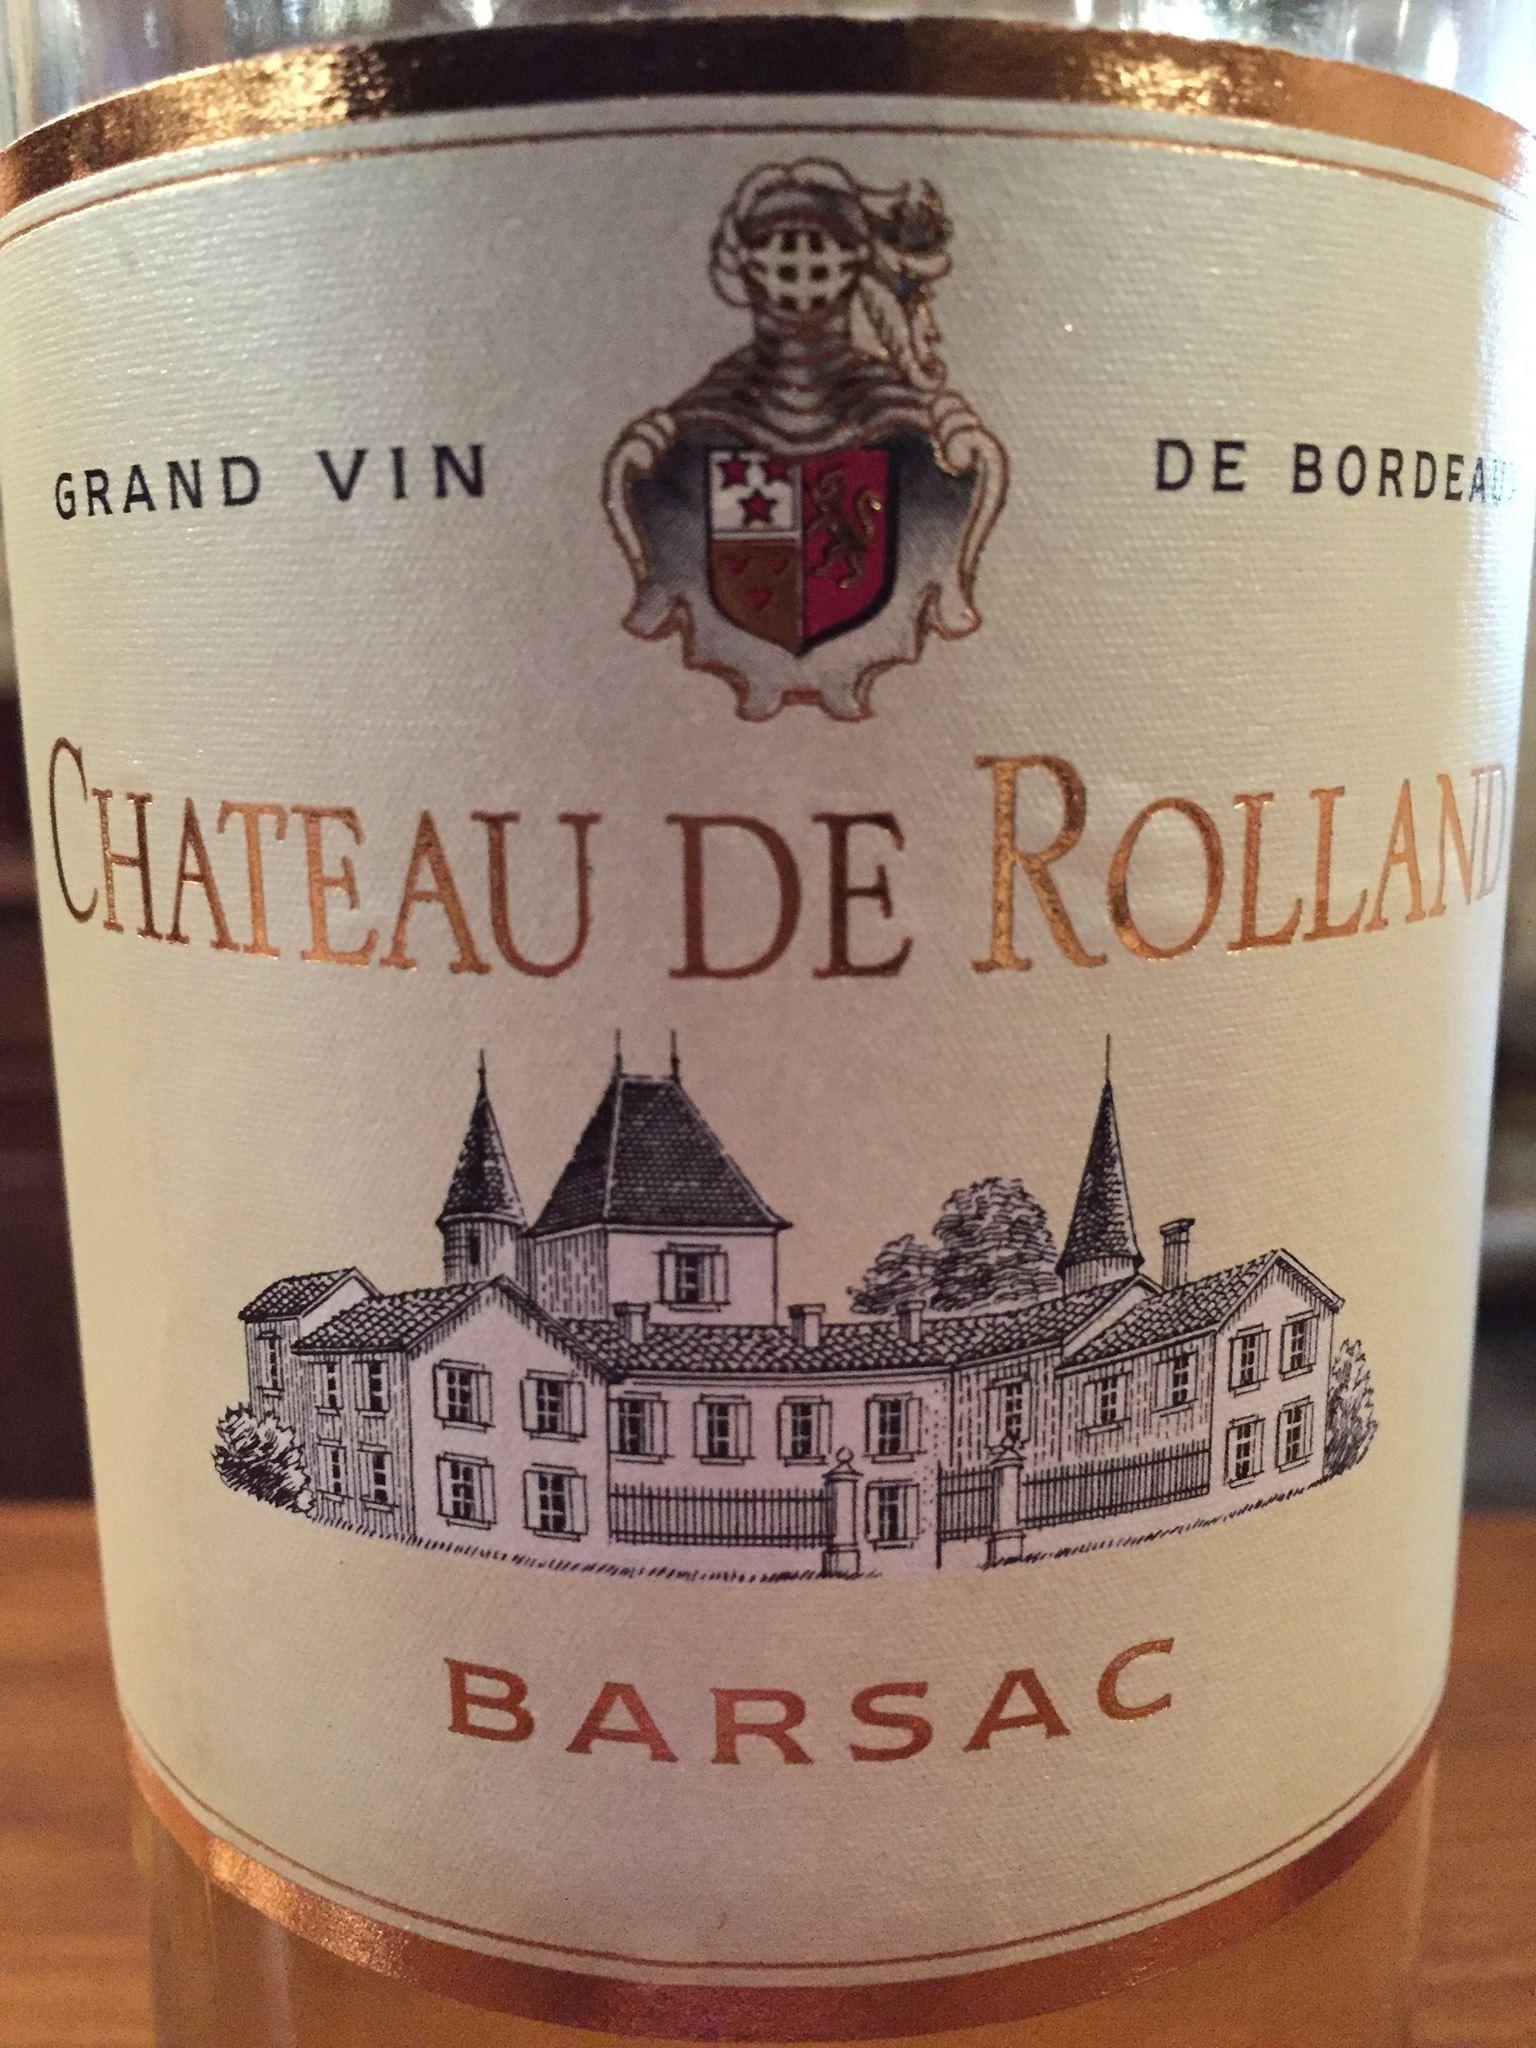 Château de Rolland 2015 – Barsac